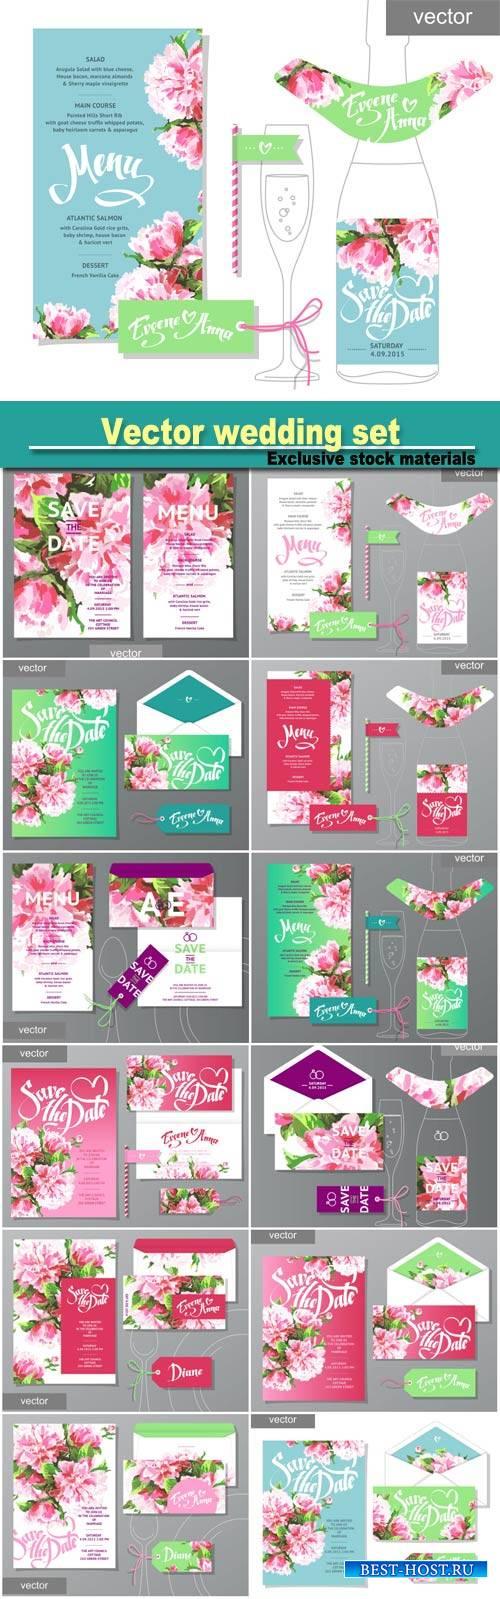 Vector wedding set, wedding menu